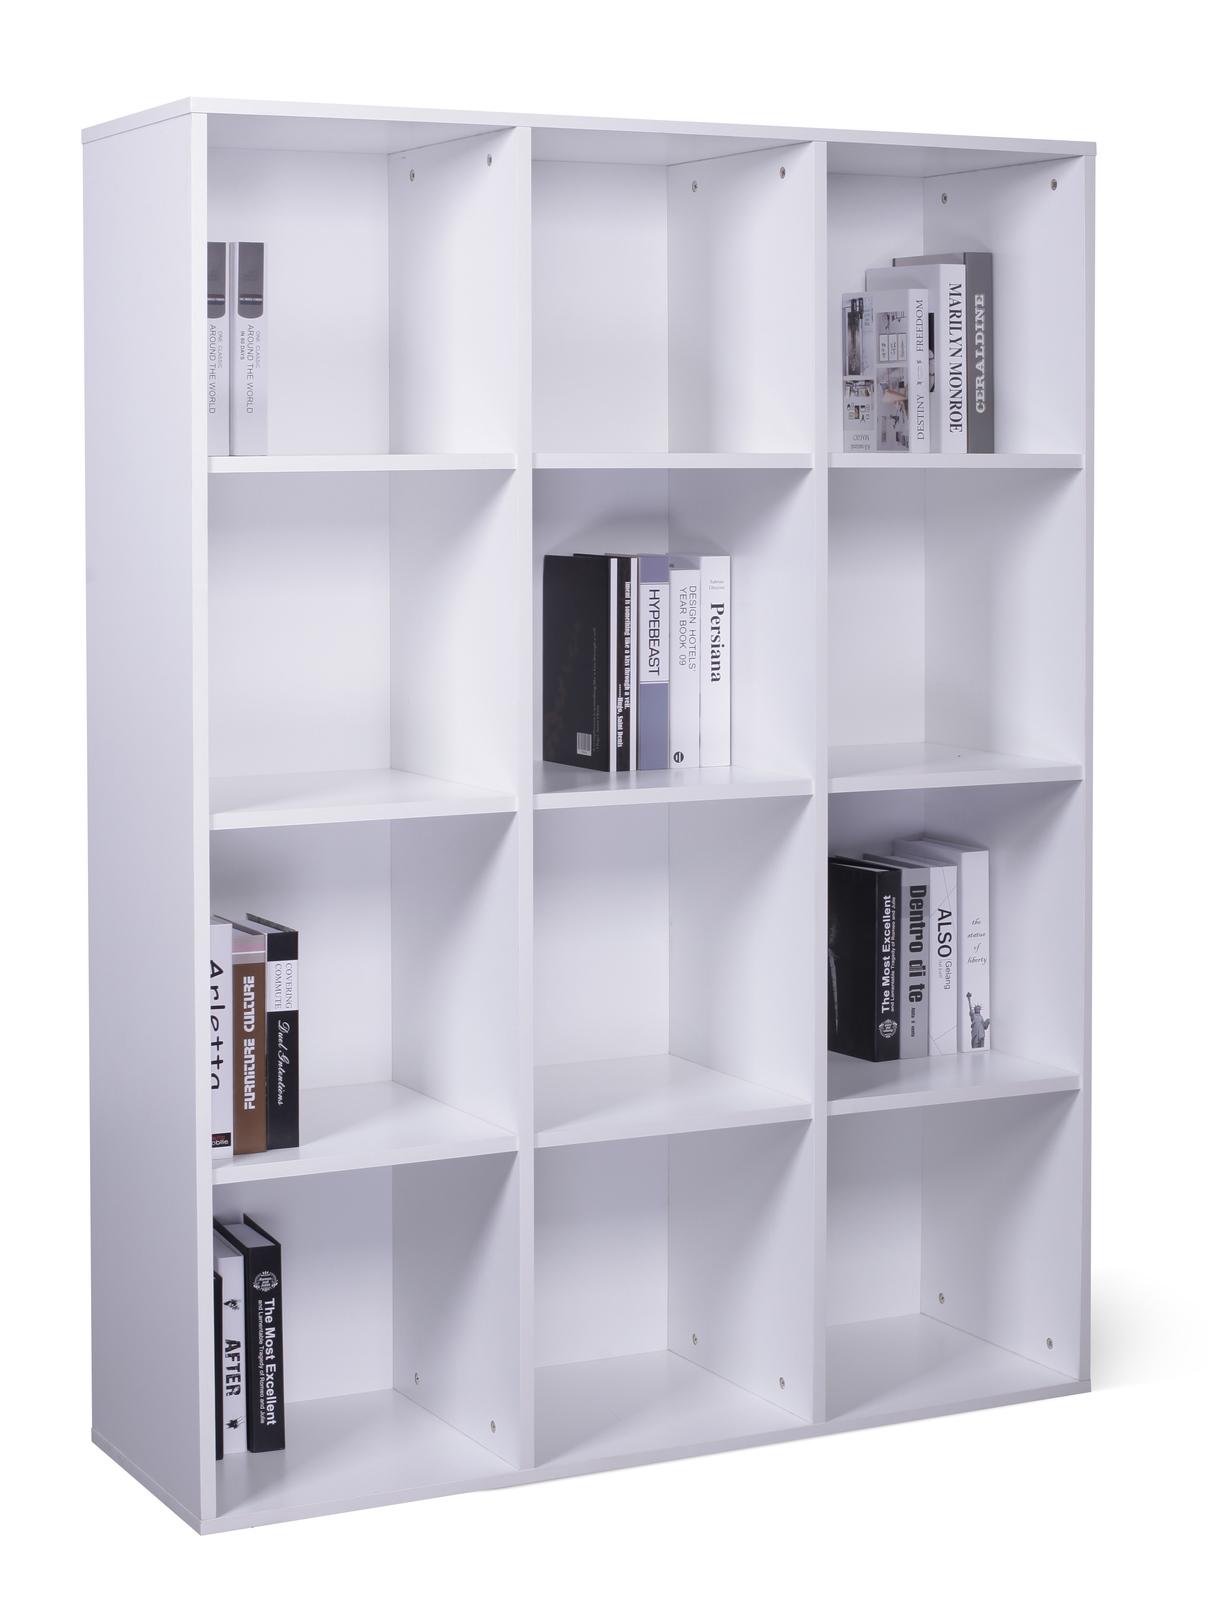 Ape Style: 12 Cube Storage Cubby - White image